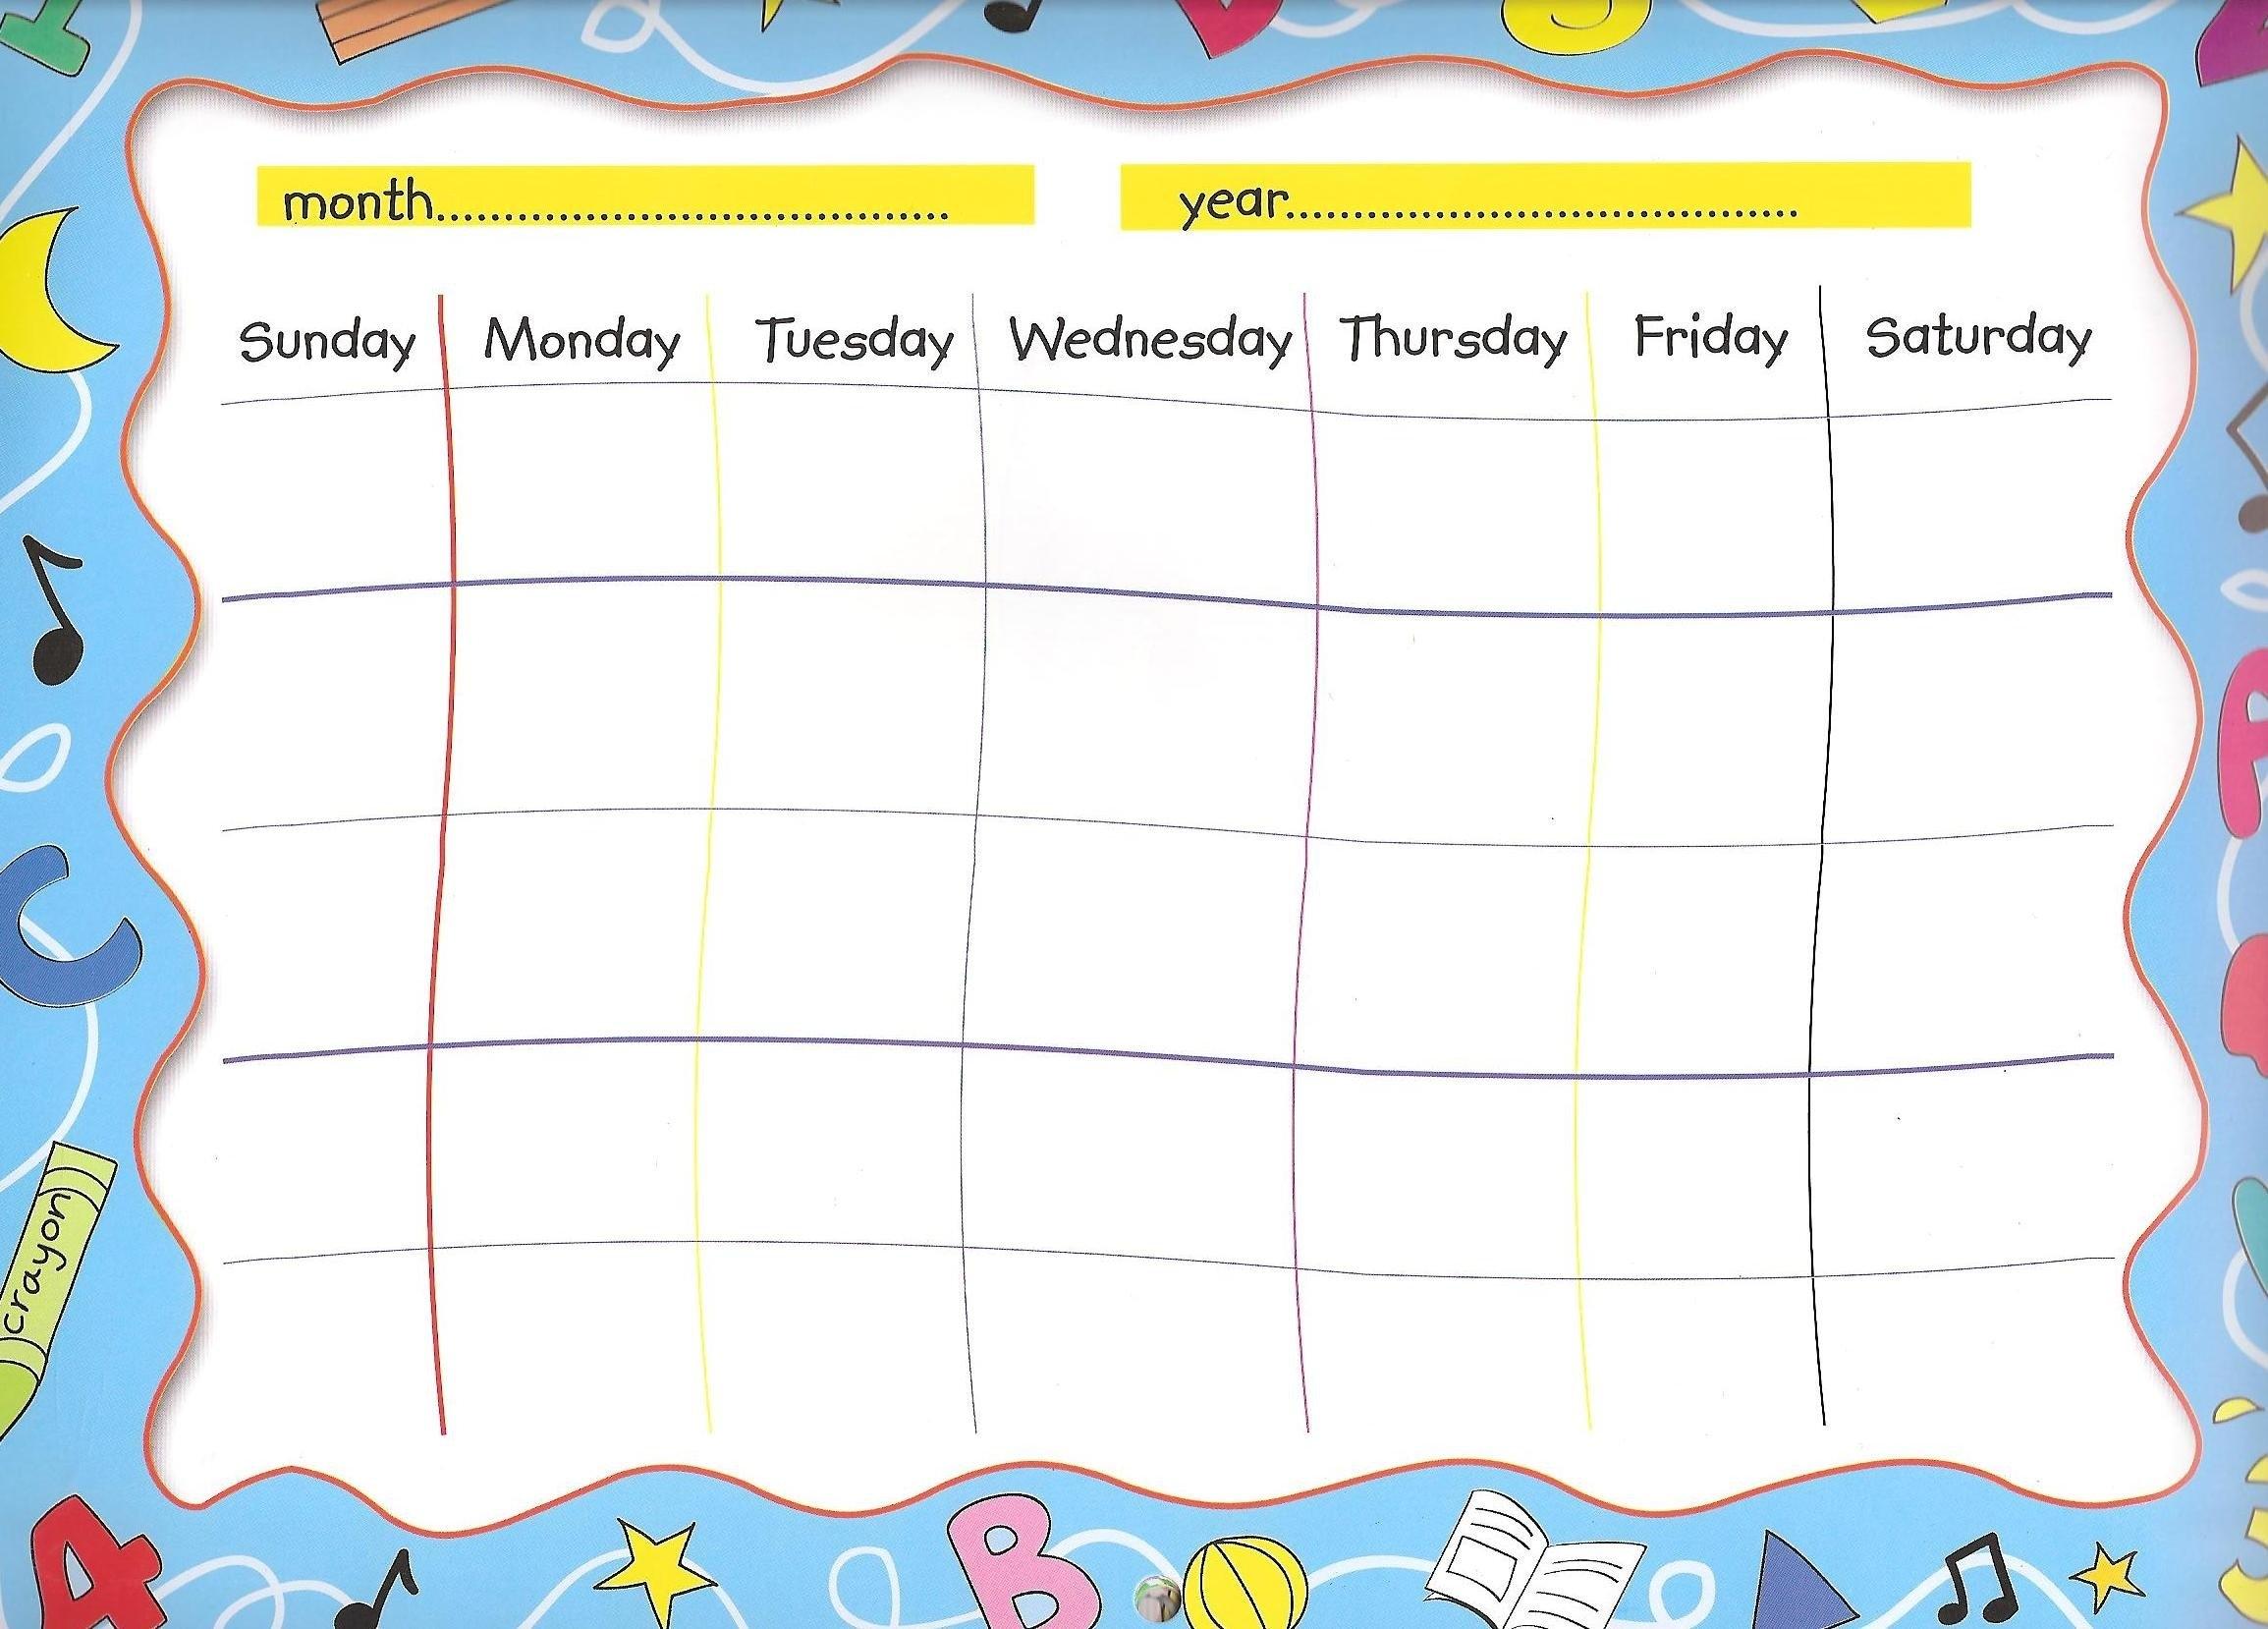 Lovely Make Your Own Calendar Free Printable | Free Printable Calendar Monthly intended for Create Your Own Calendar For Free Image